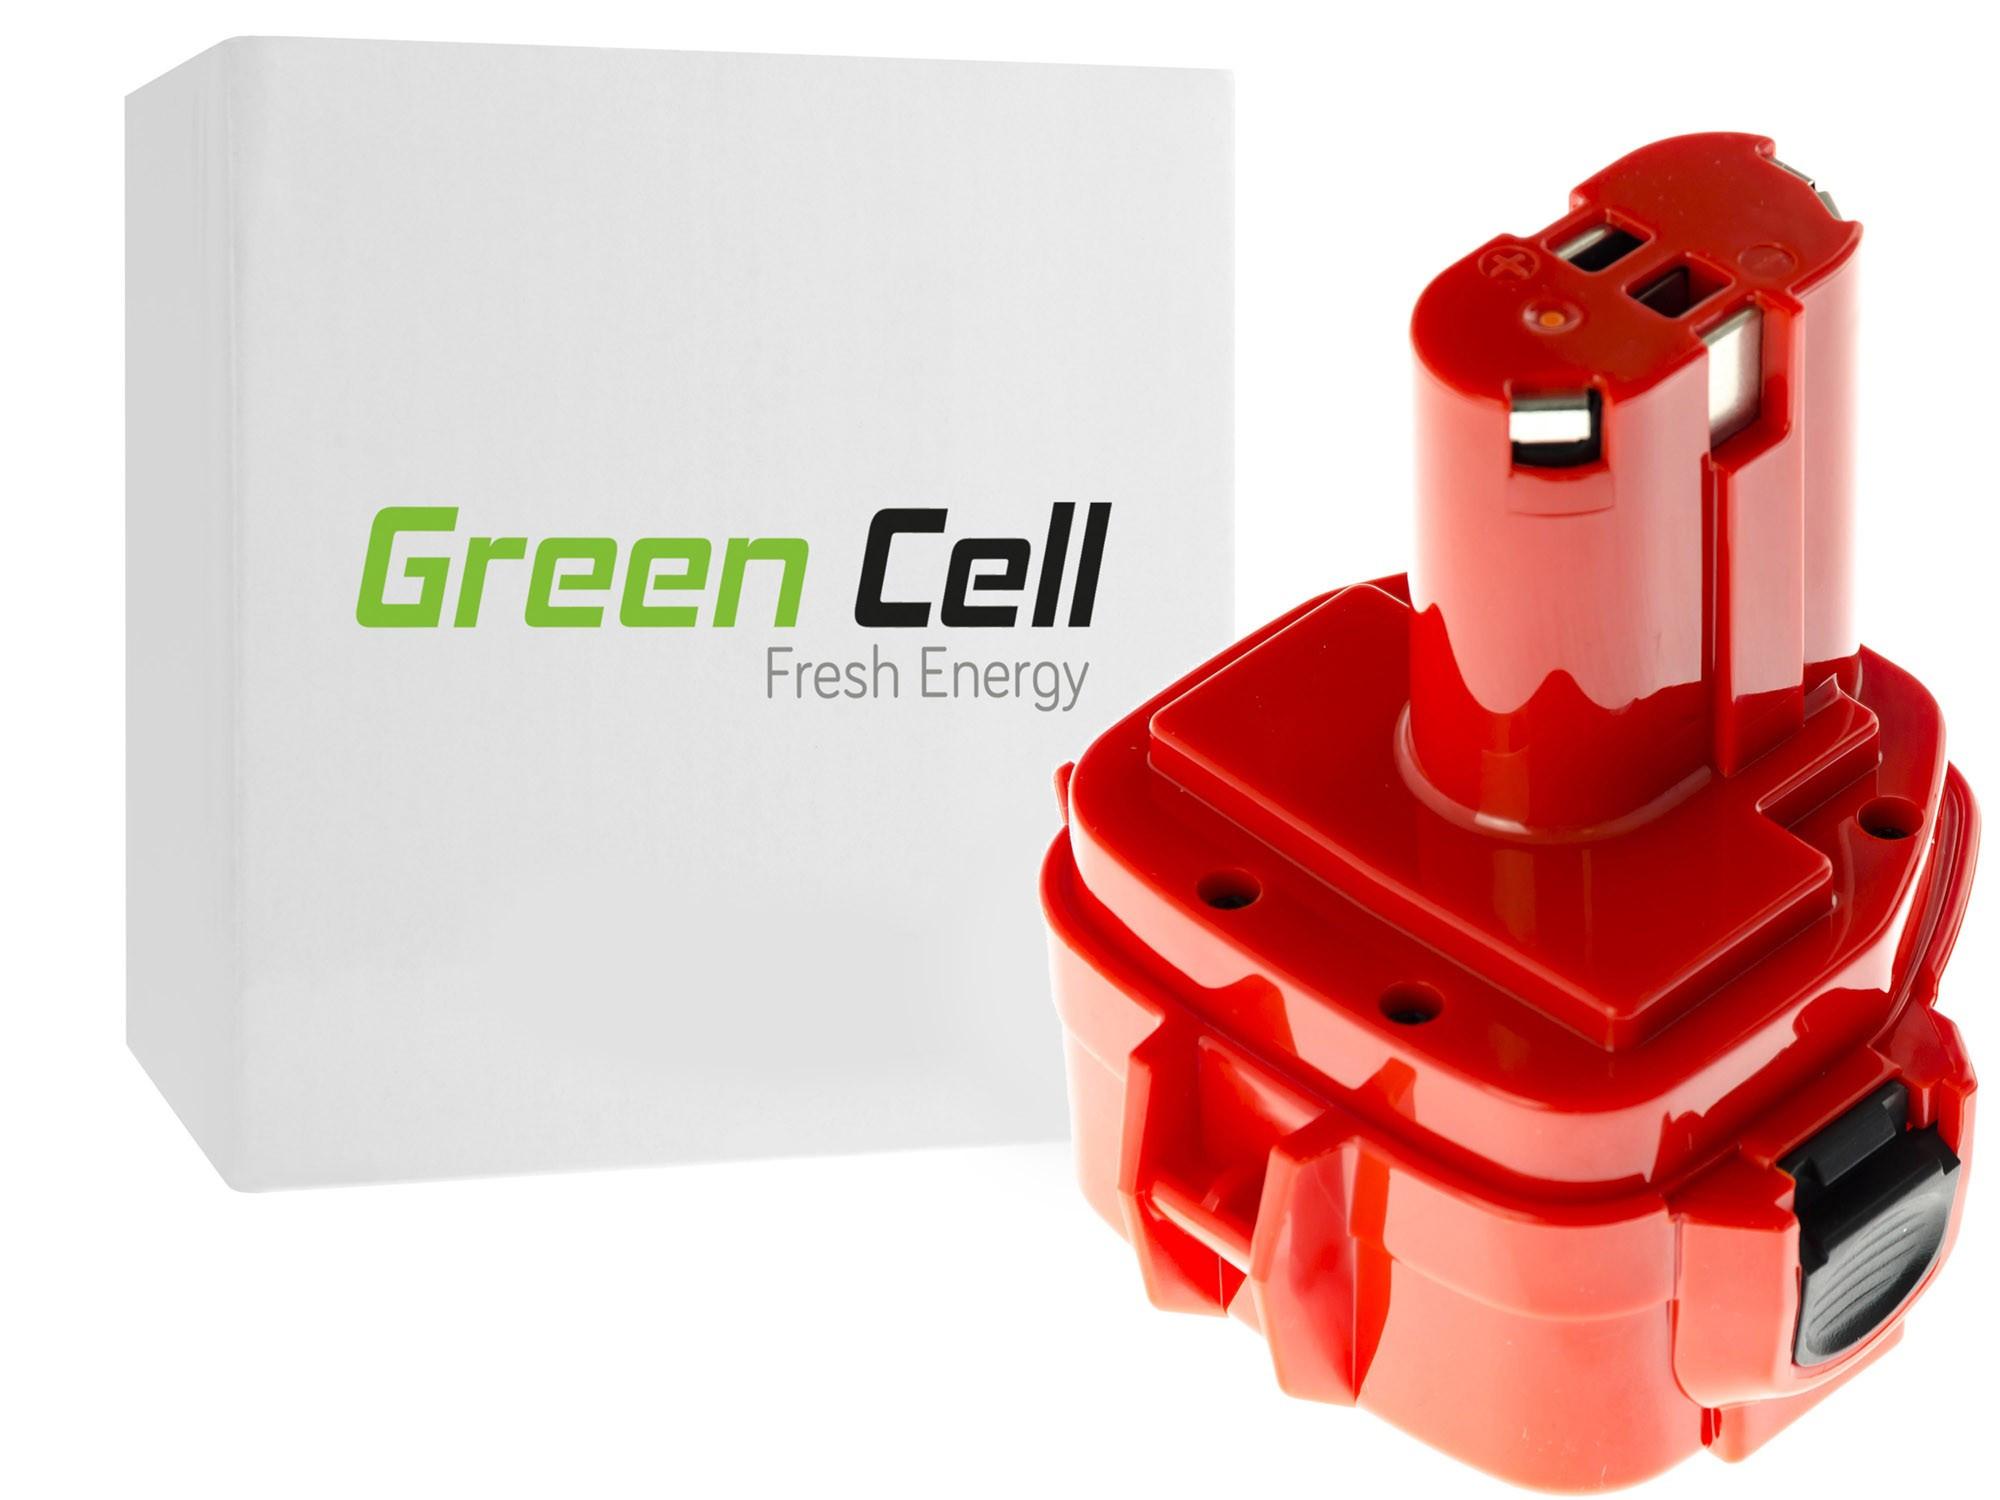 Baterie Green Cell Baterie Makita 1220 Makita Celma WAK12 12V 2000mAh Ni-CD – neoriginální